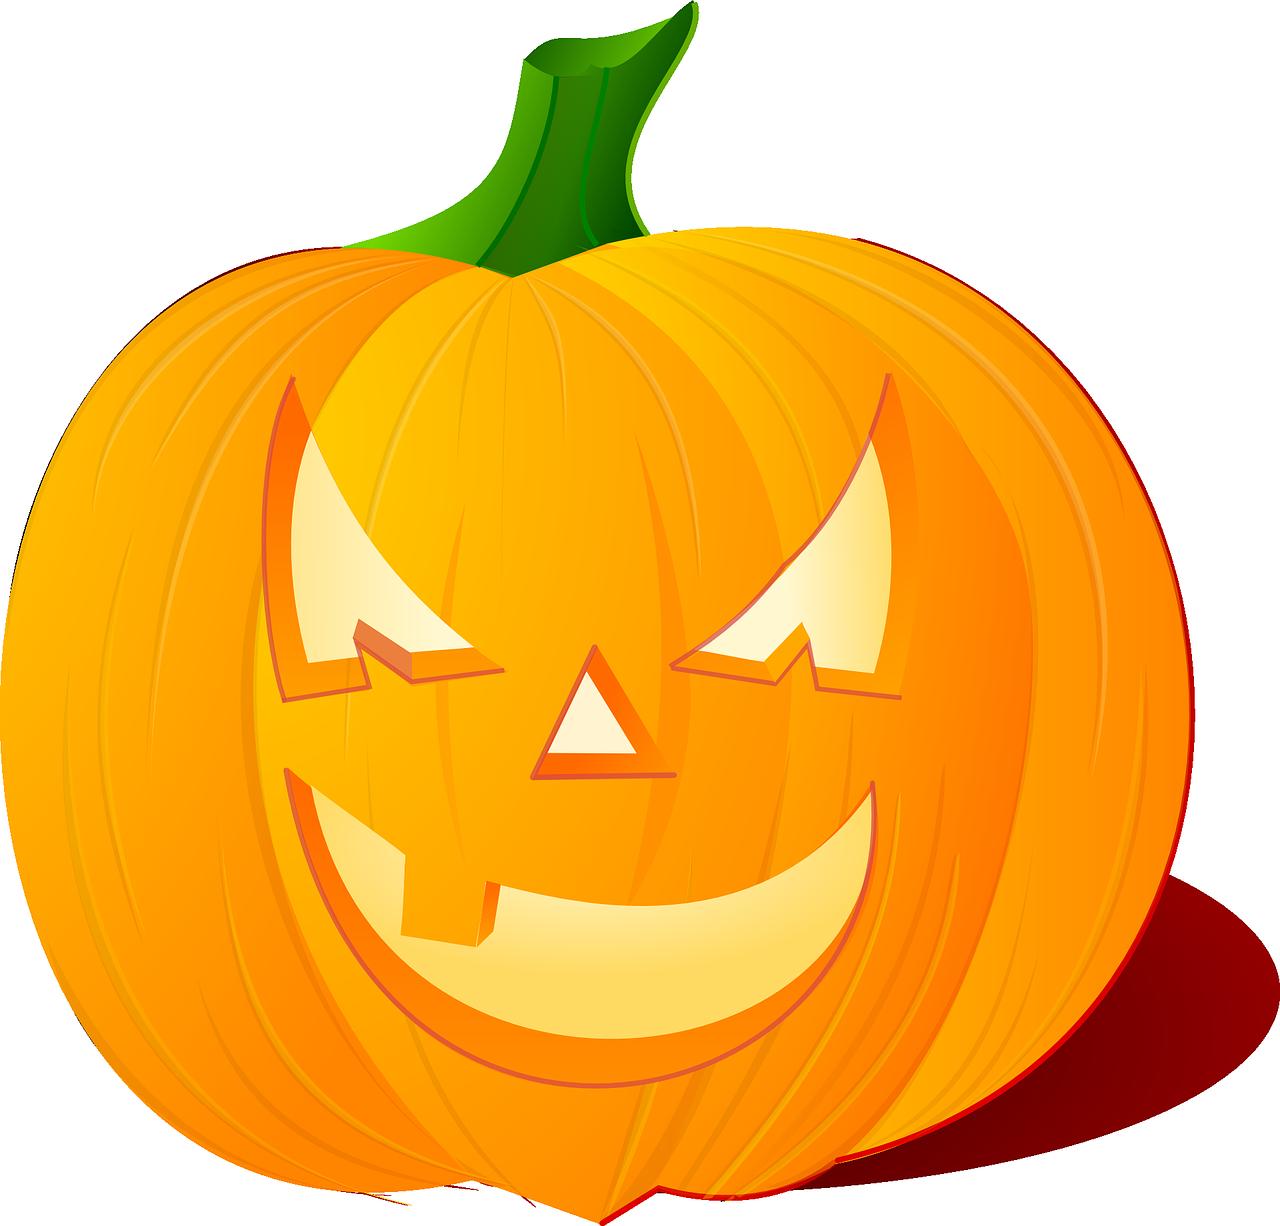 pumpkin-23439_1280.png